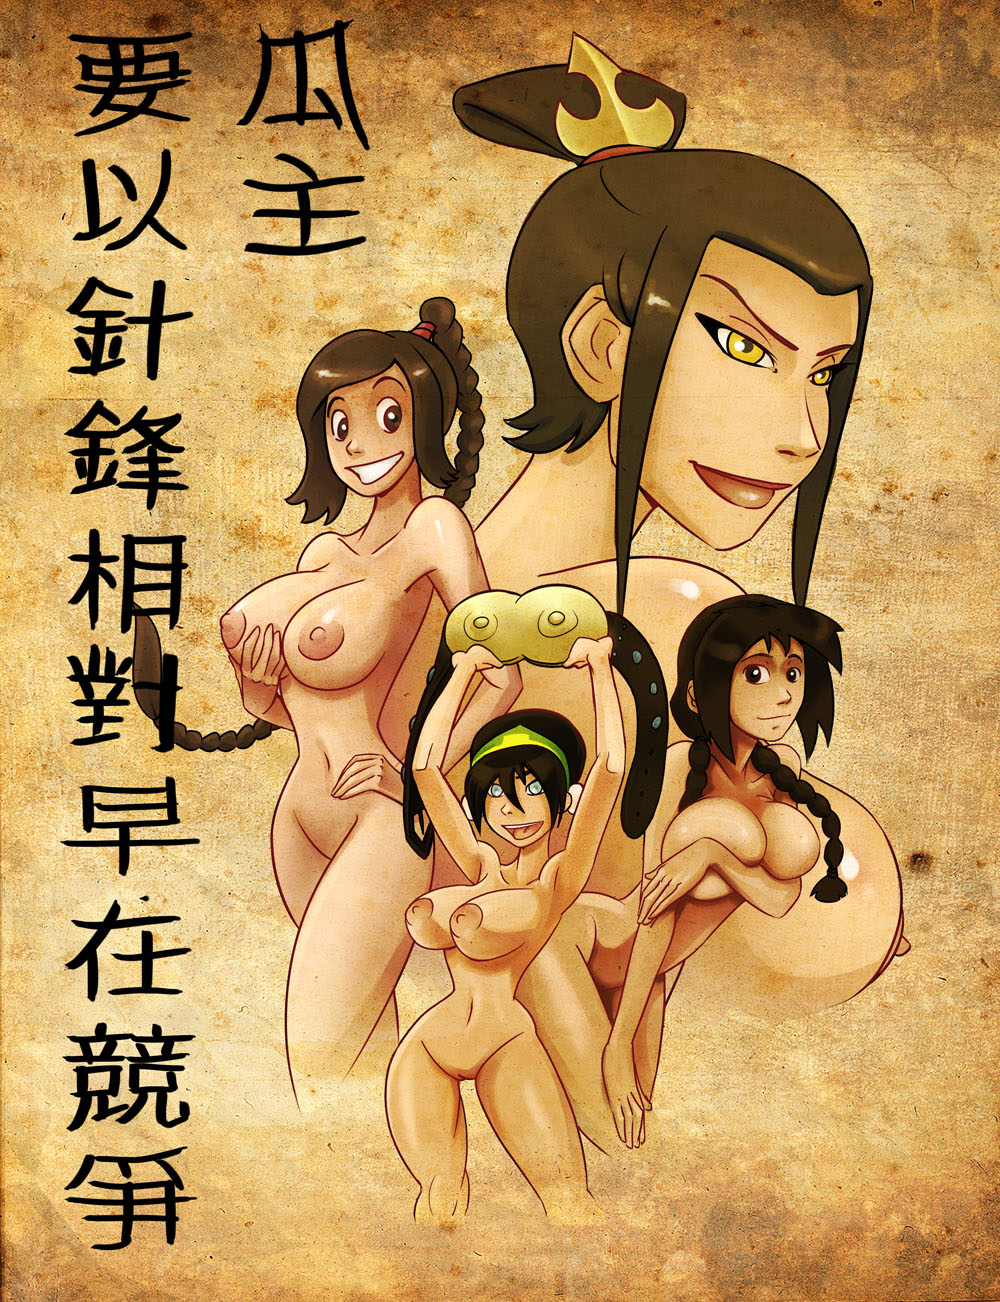 the jin hentai last avatar airbender Breath of the wild topaz